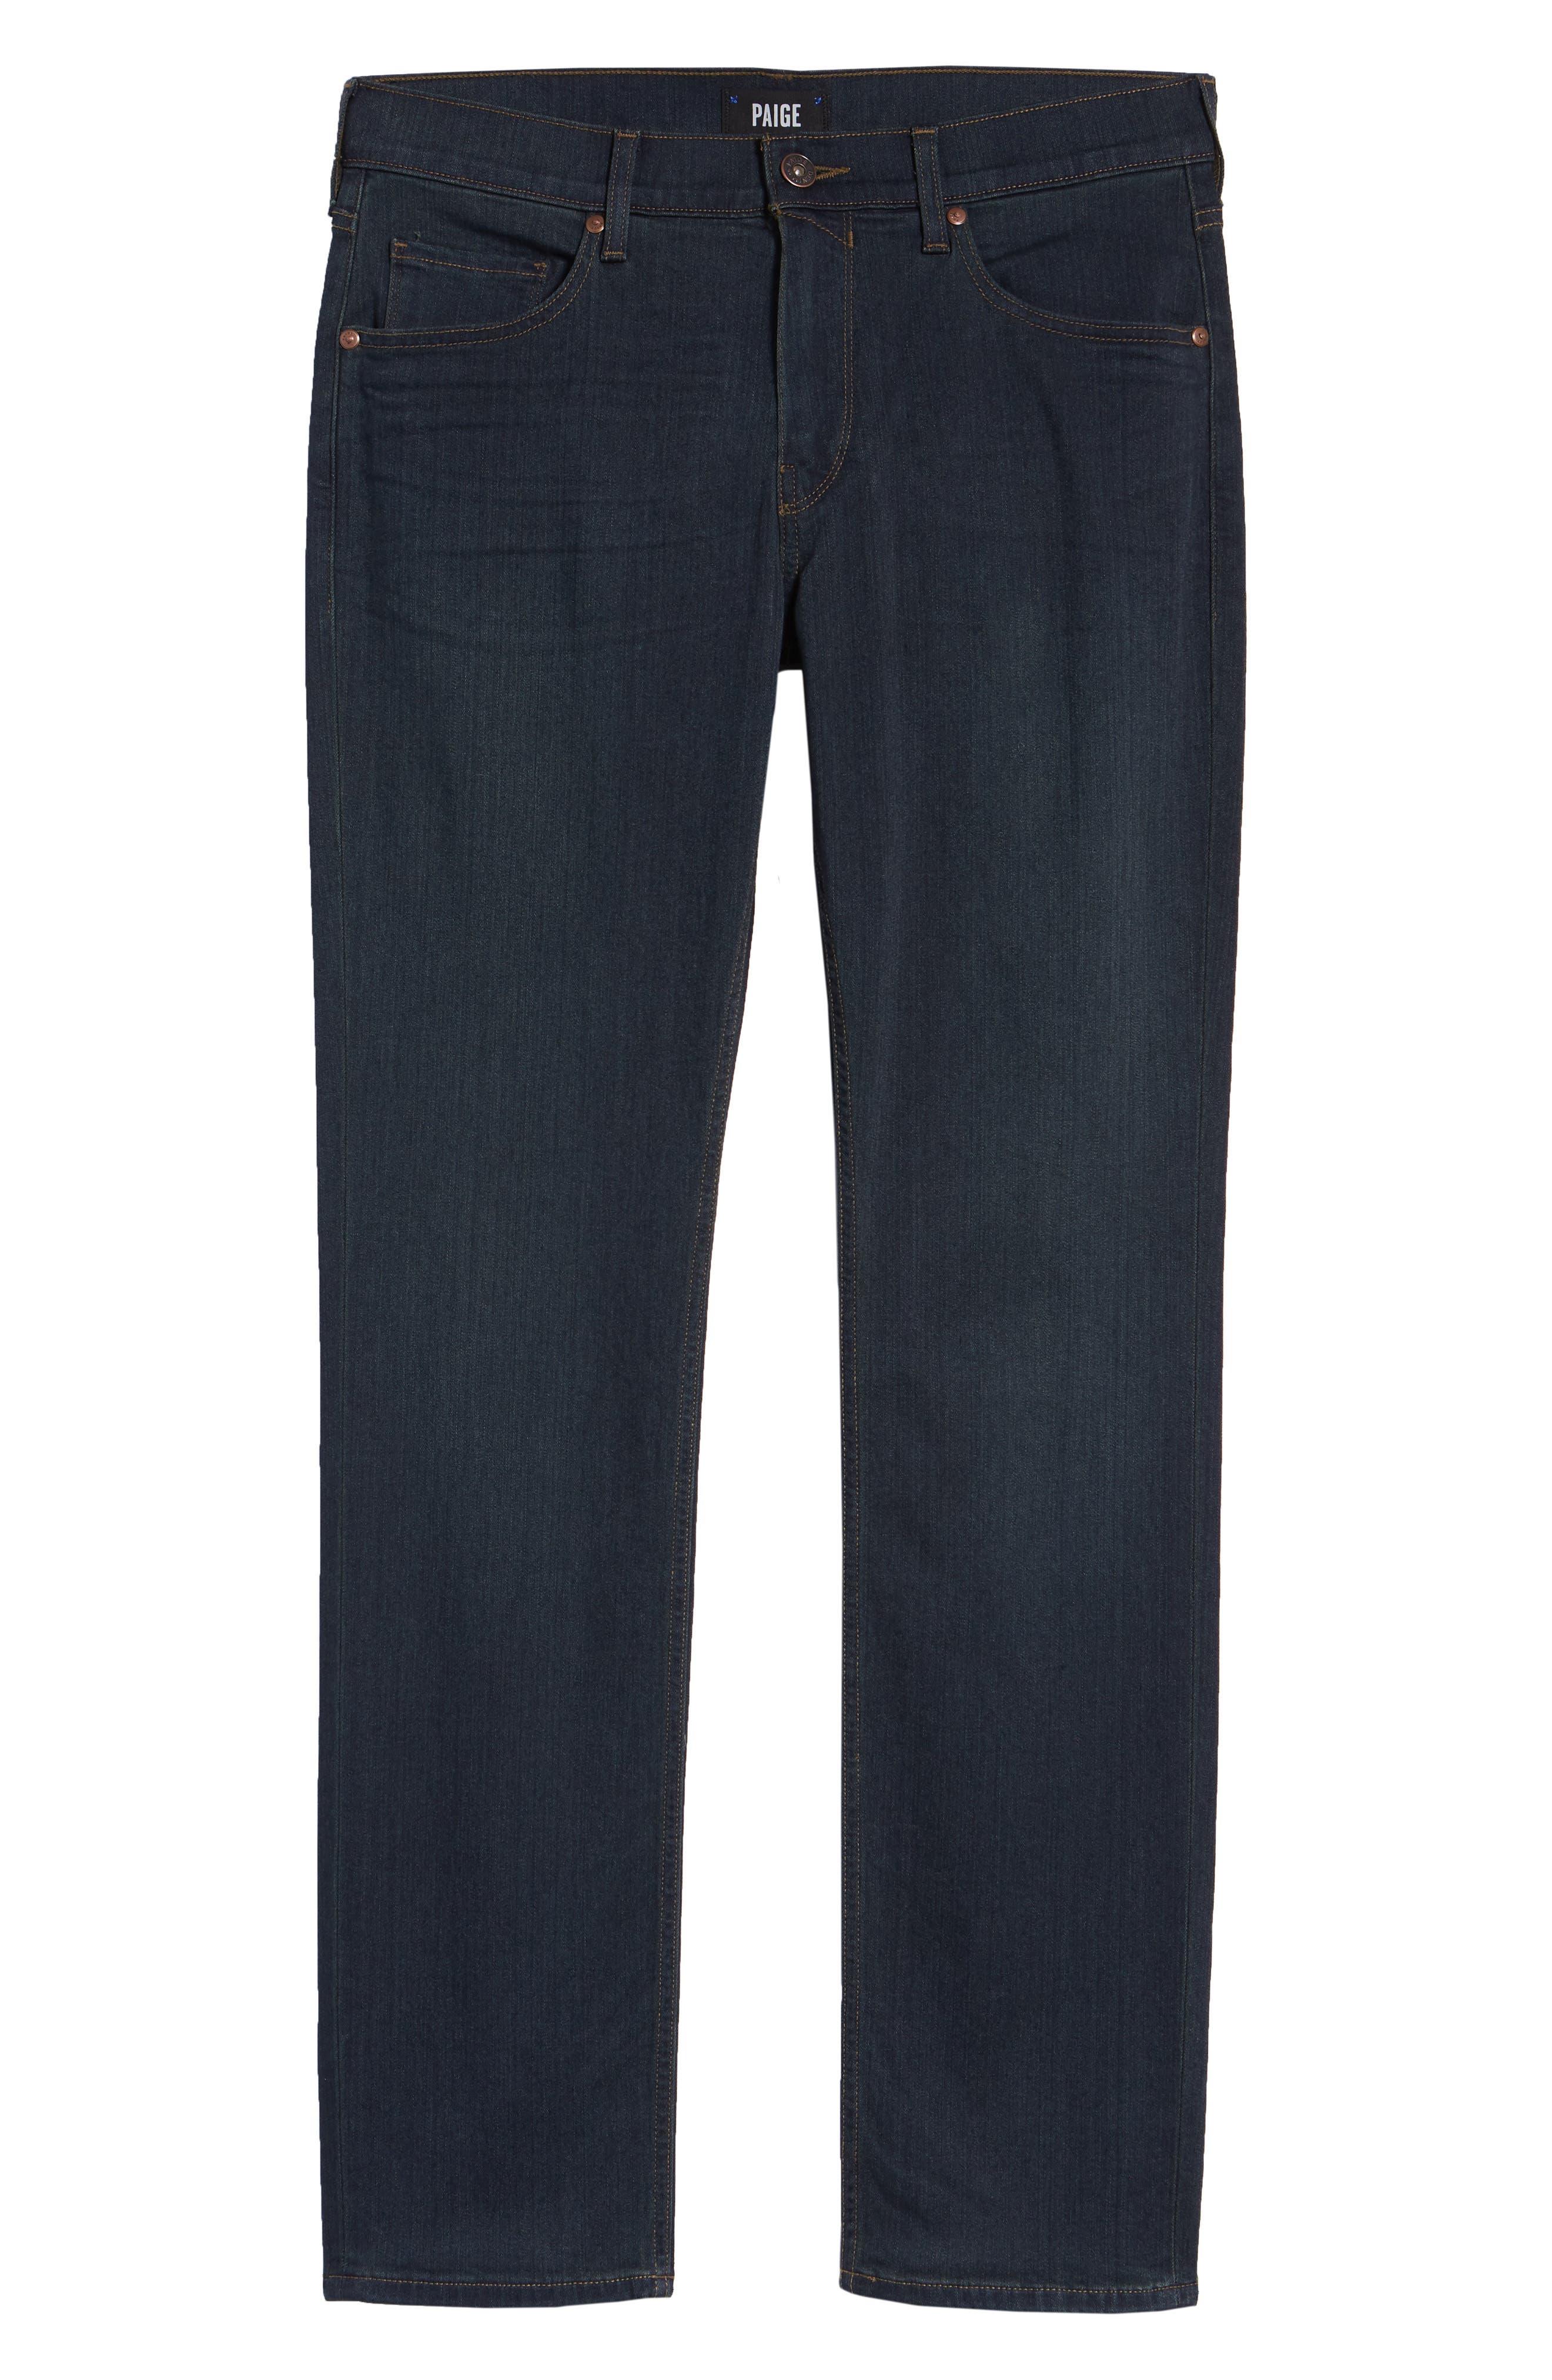 PAIGE, Transcend - Federal Slim Straight Leg Jeans, Alternate thumbnail 2, color, CELLAR/ CELLAR